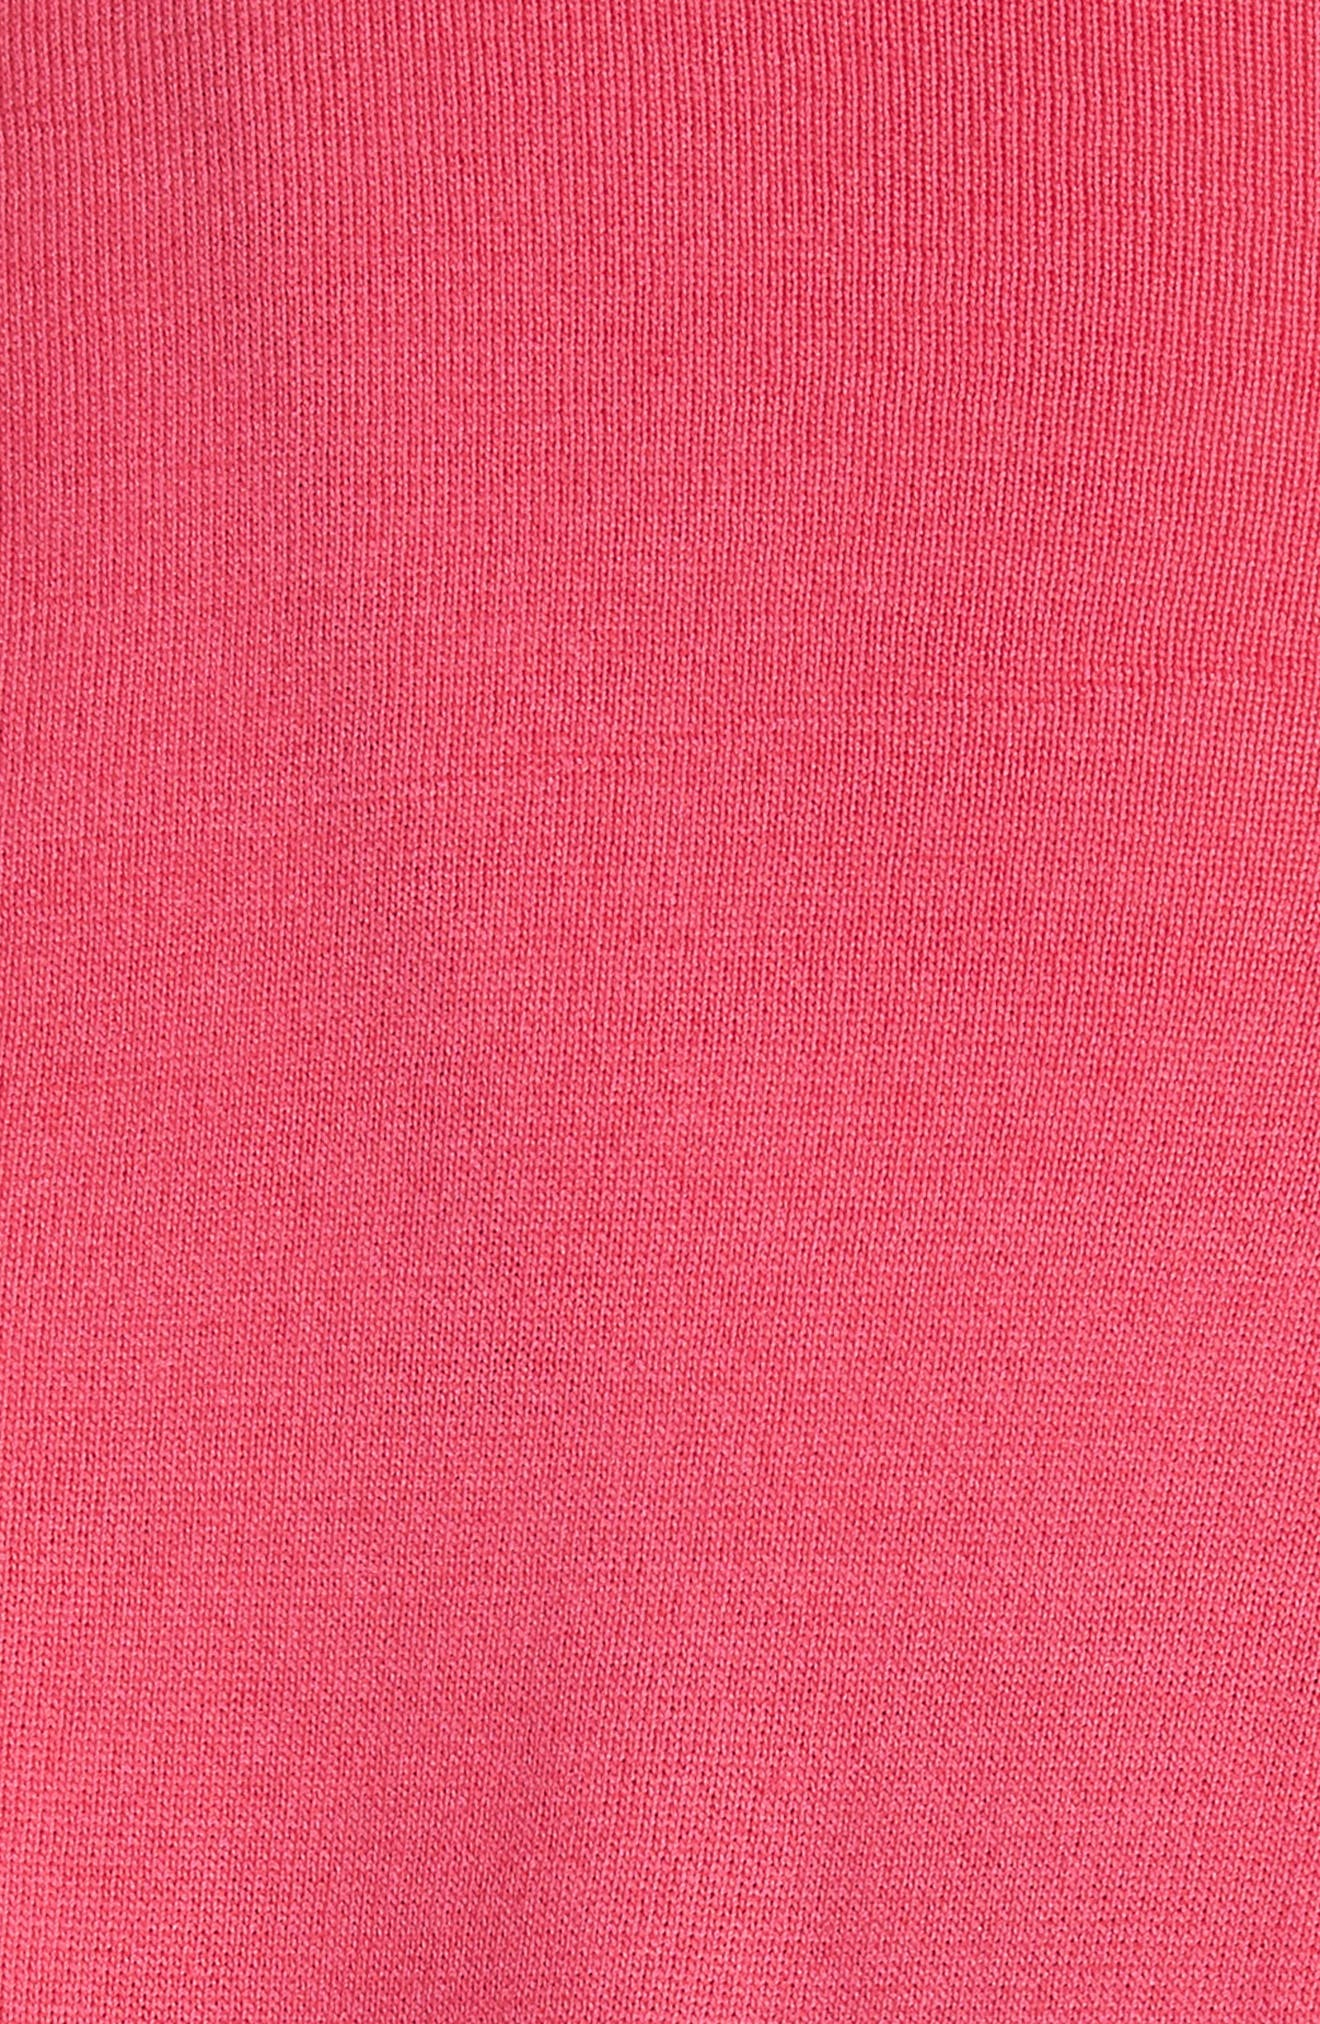 Maglia Ruffle Hem Tricot Cardigan,                             Alternate thumbnail 5, color,                             Fuchsia